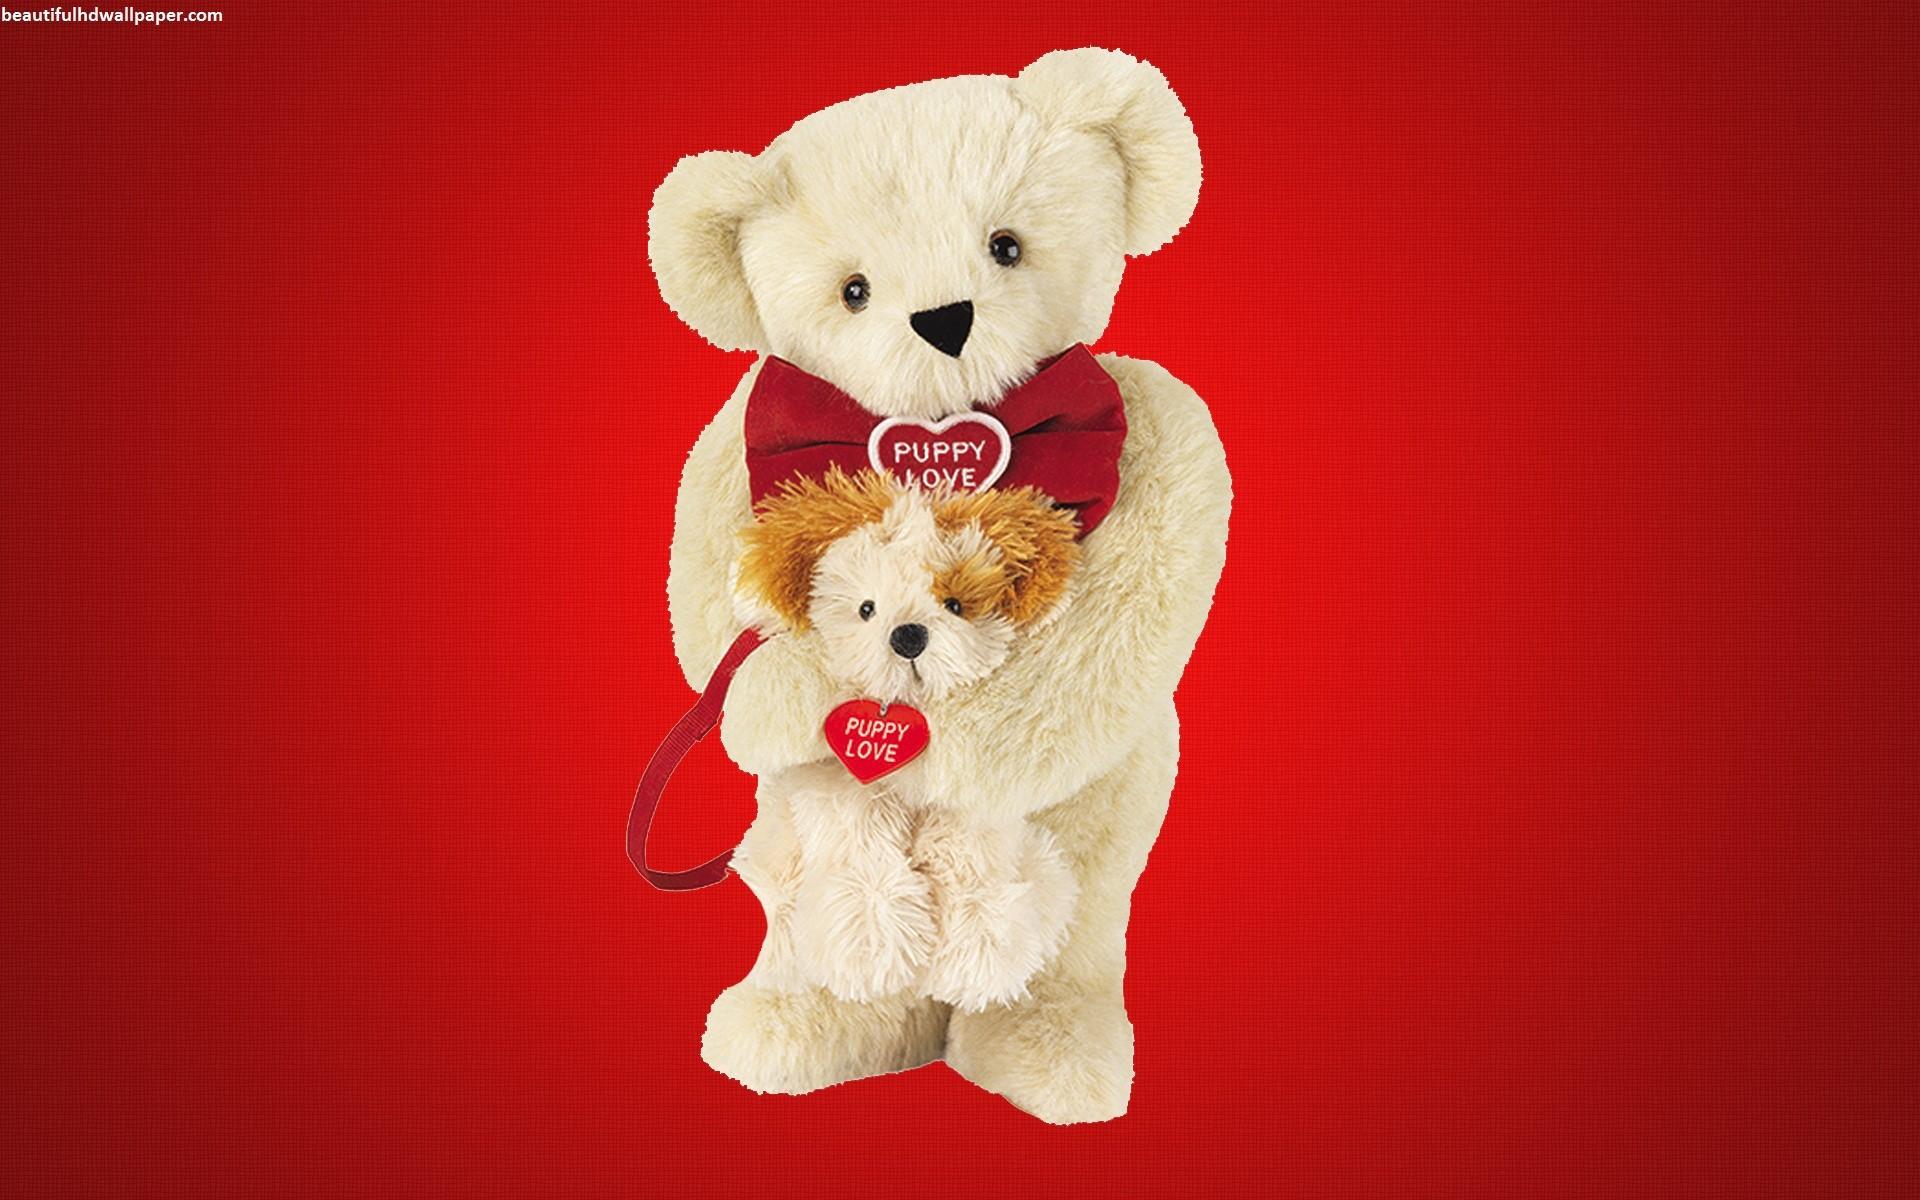 56-Puppy-love-teddy-bear(Teddy-Bear-Wallpaper)